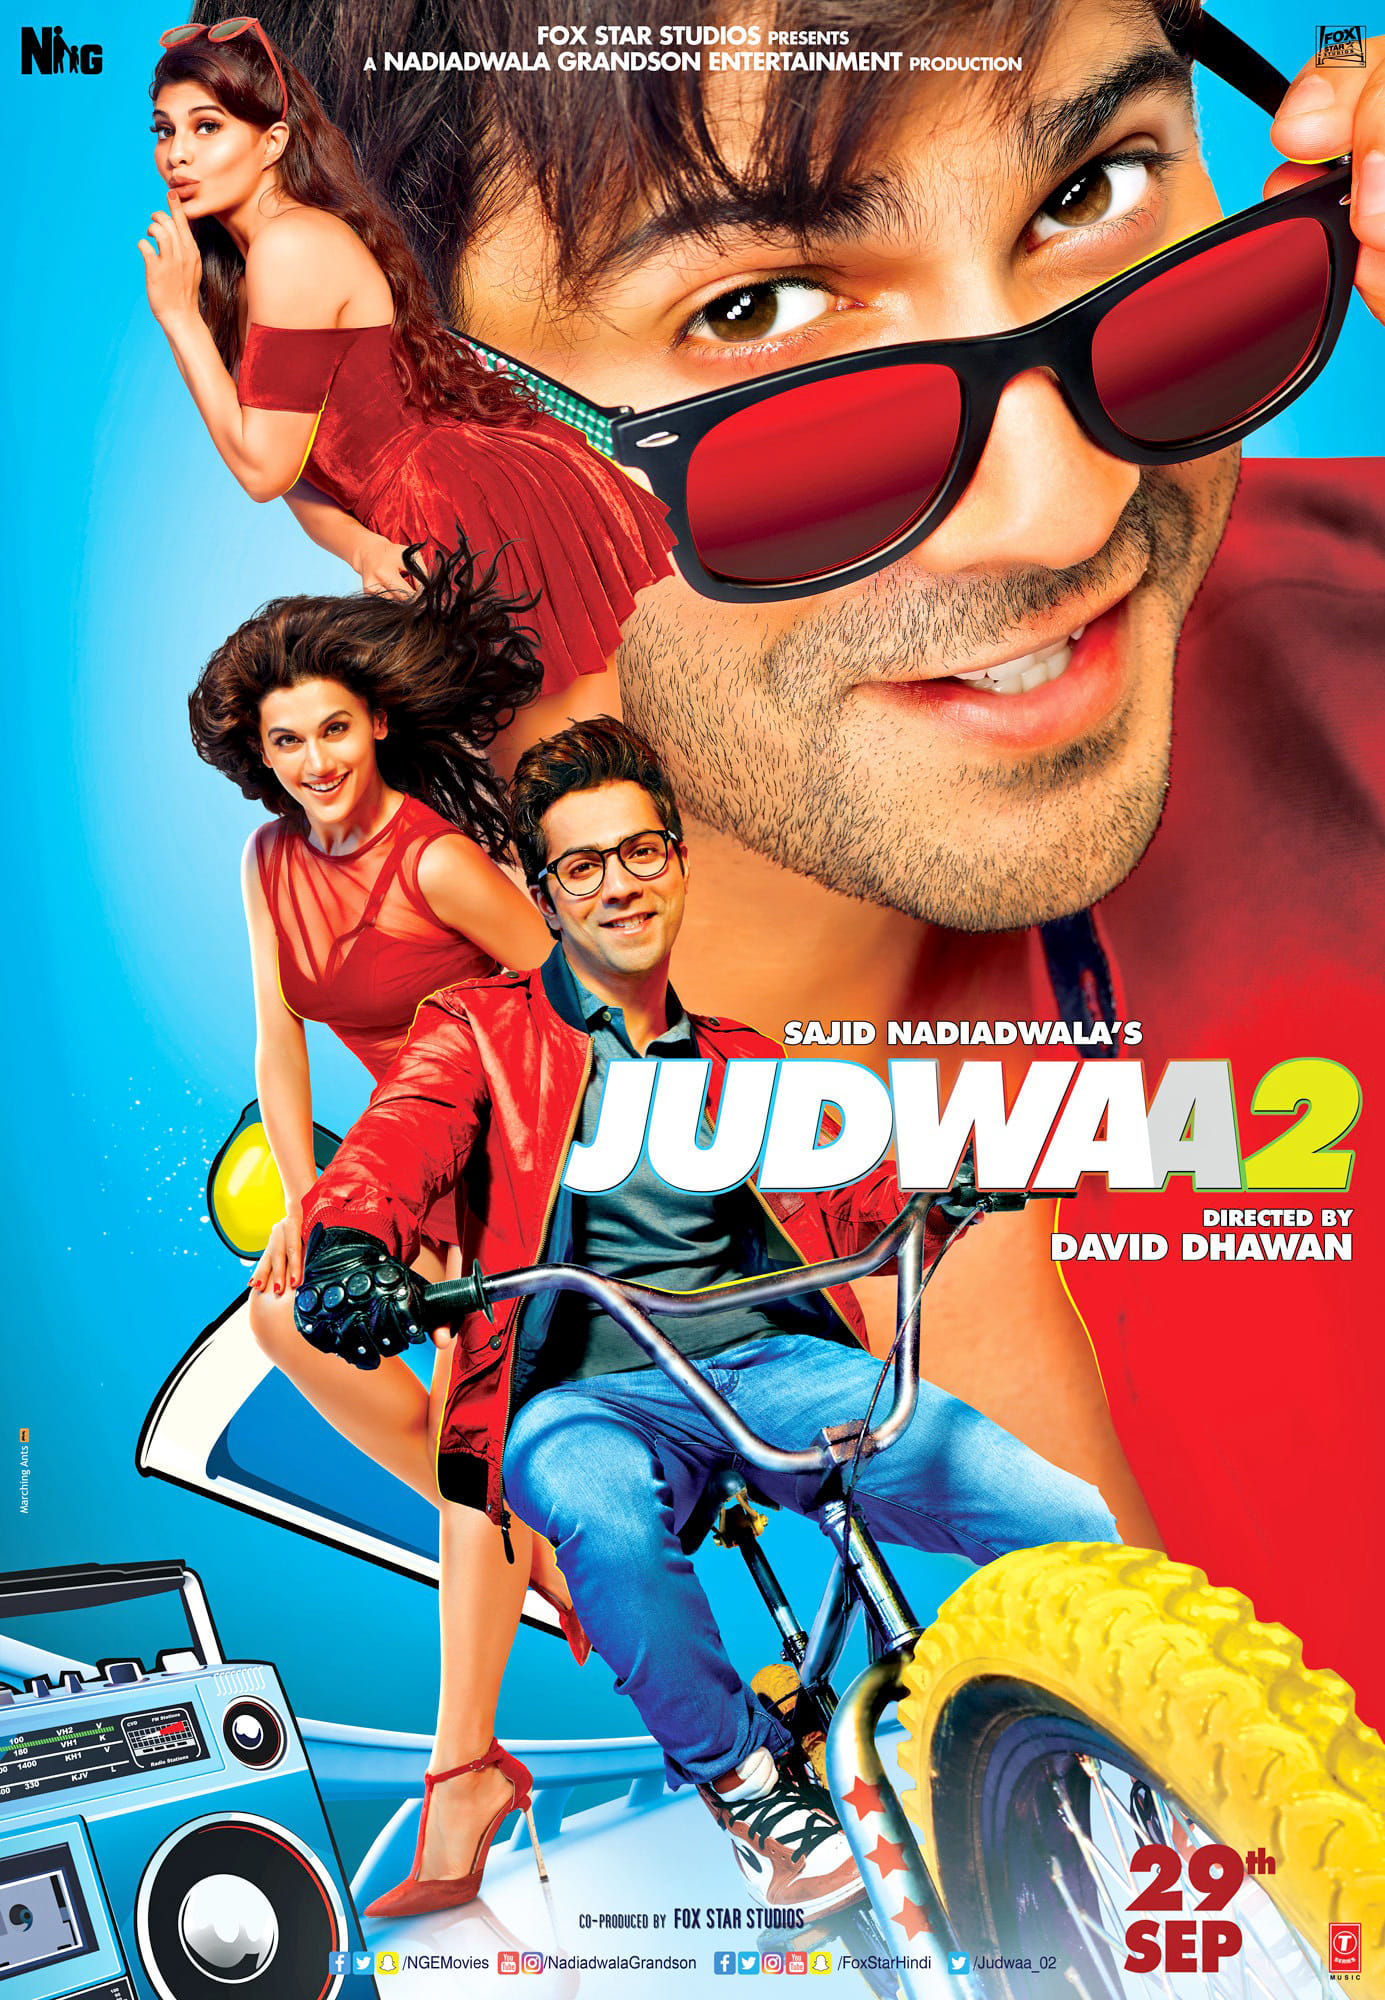 Twins 2 a.k.a Judwaa 2 (2017)